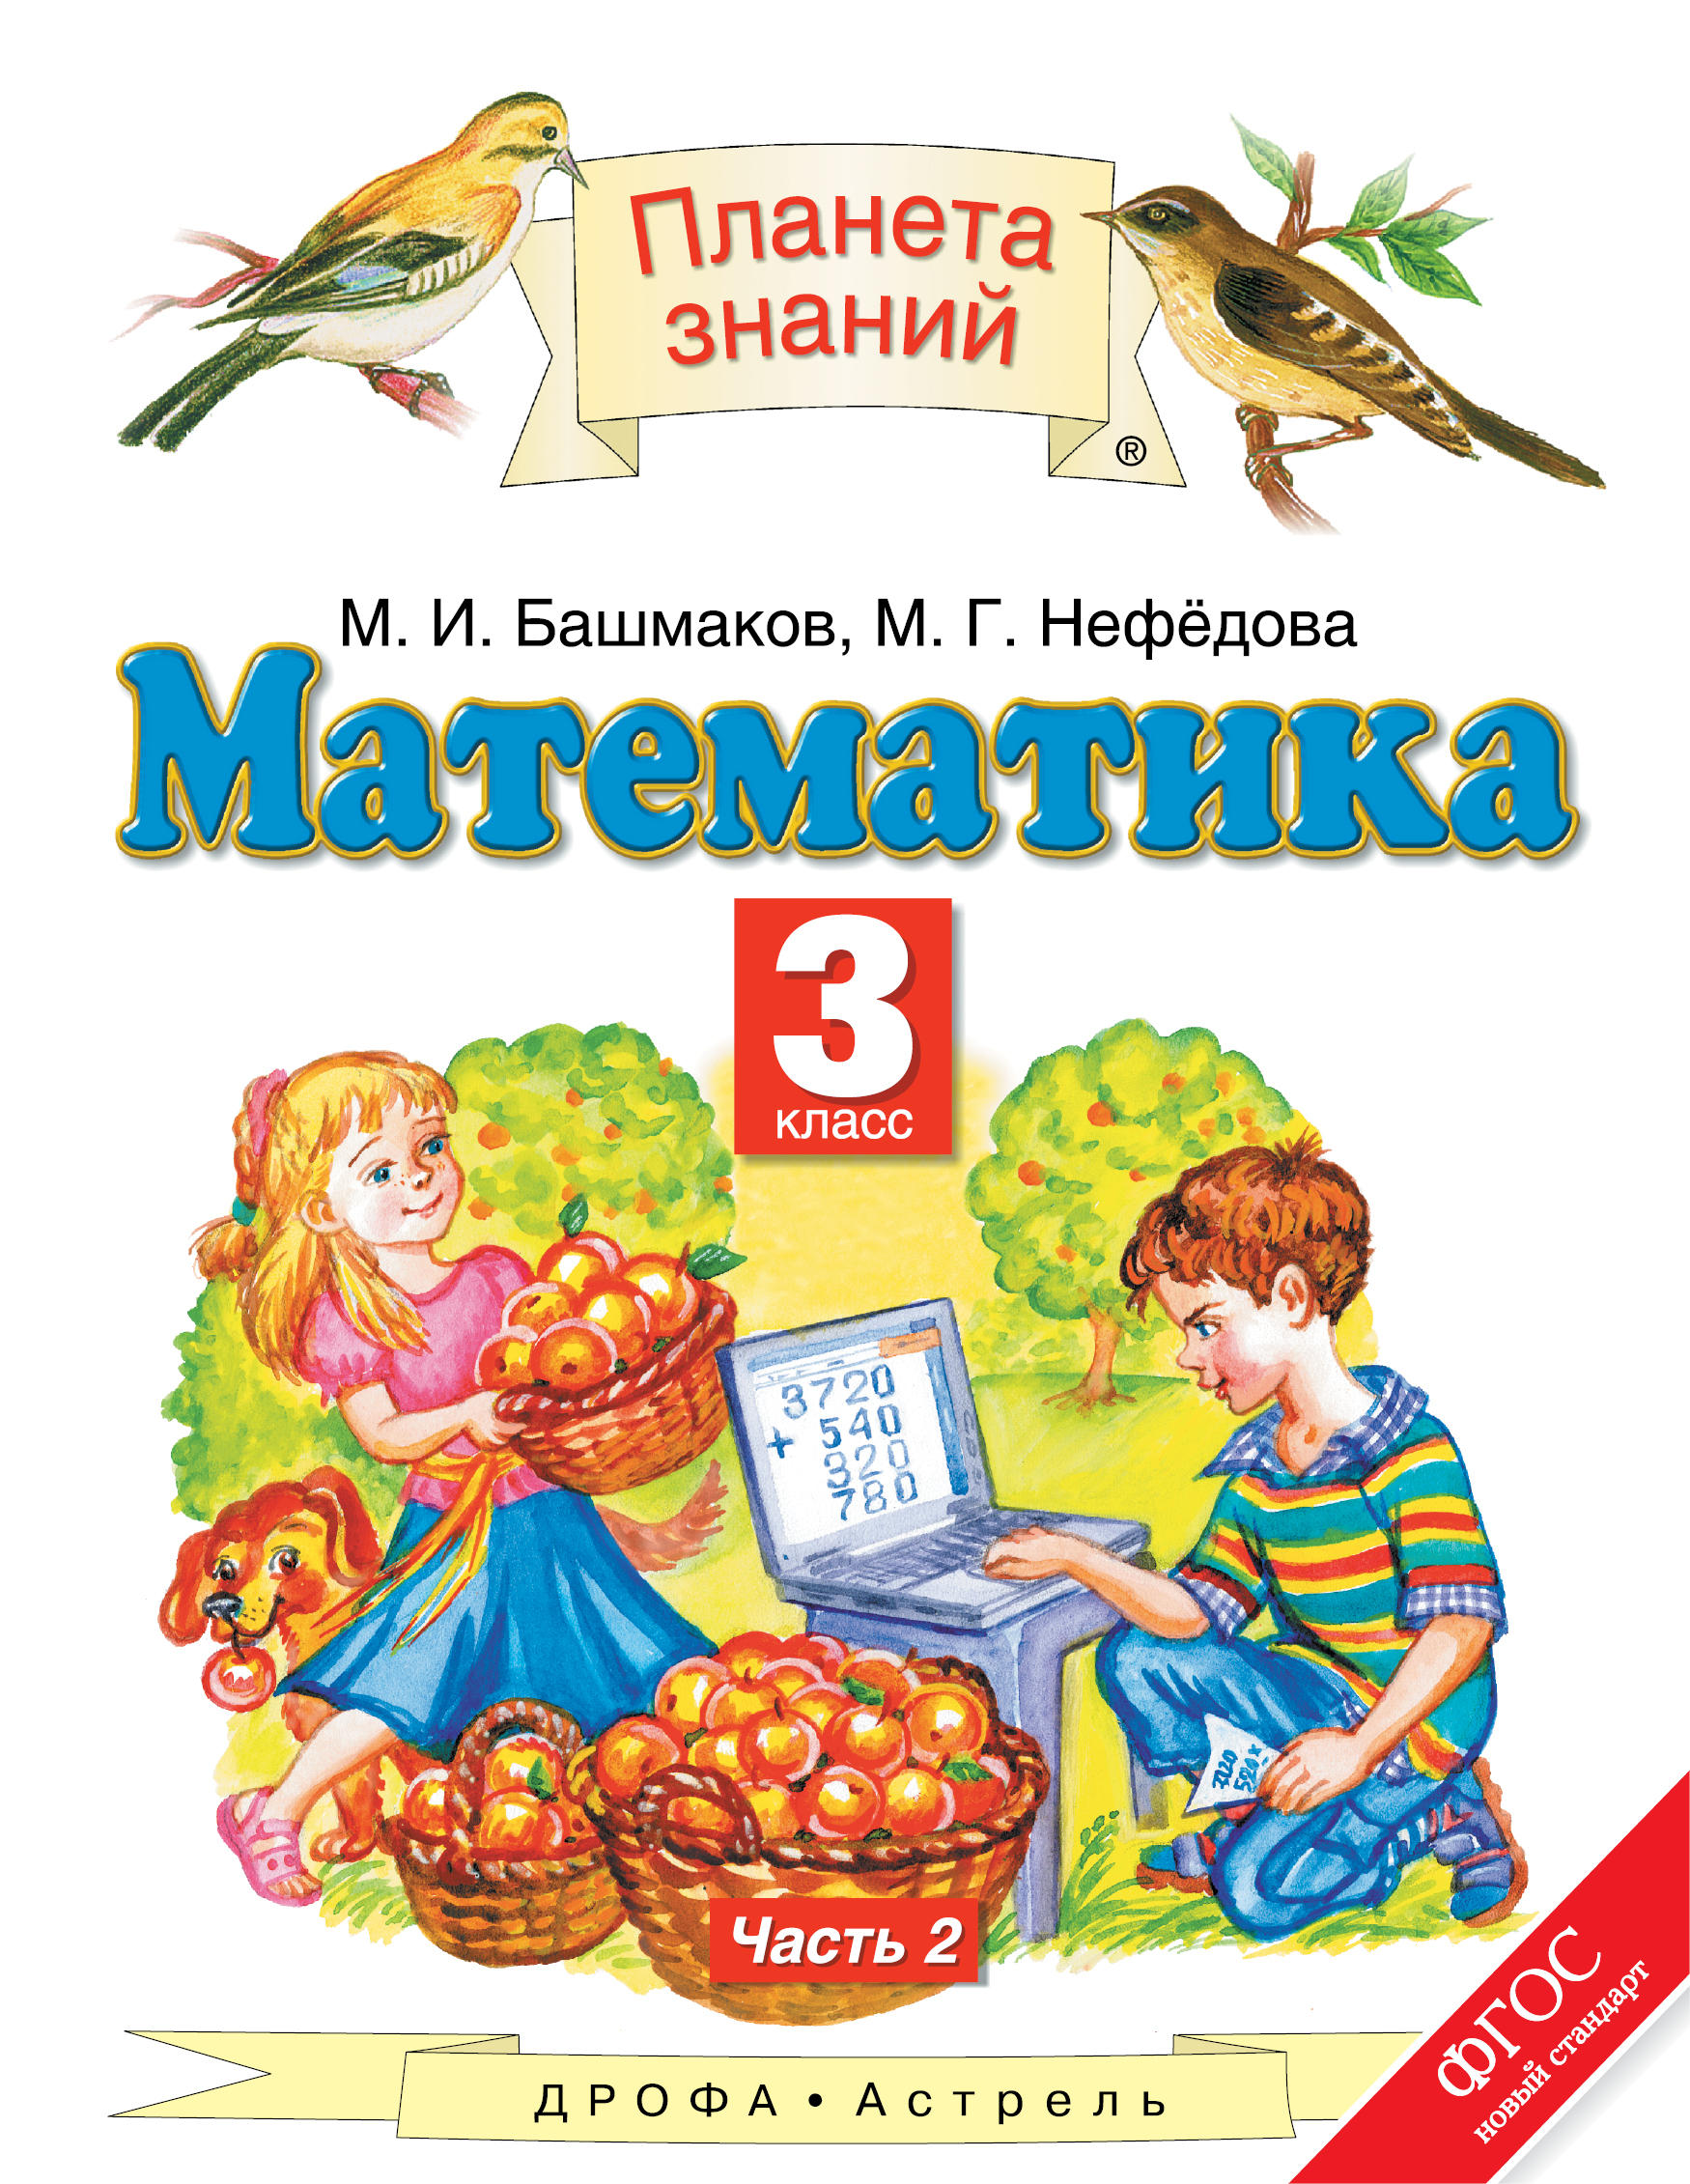 Математика. 3 класс. Учебник. Часть 2, Башмаков Марк Иванович; Нефедова М. Г.